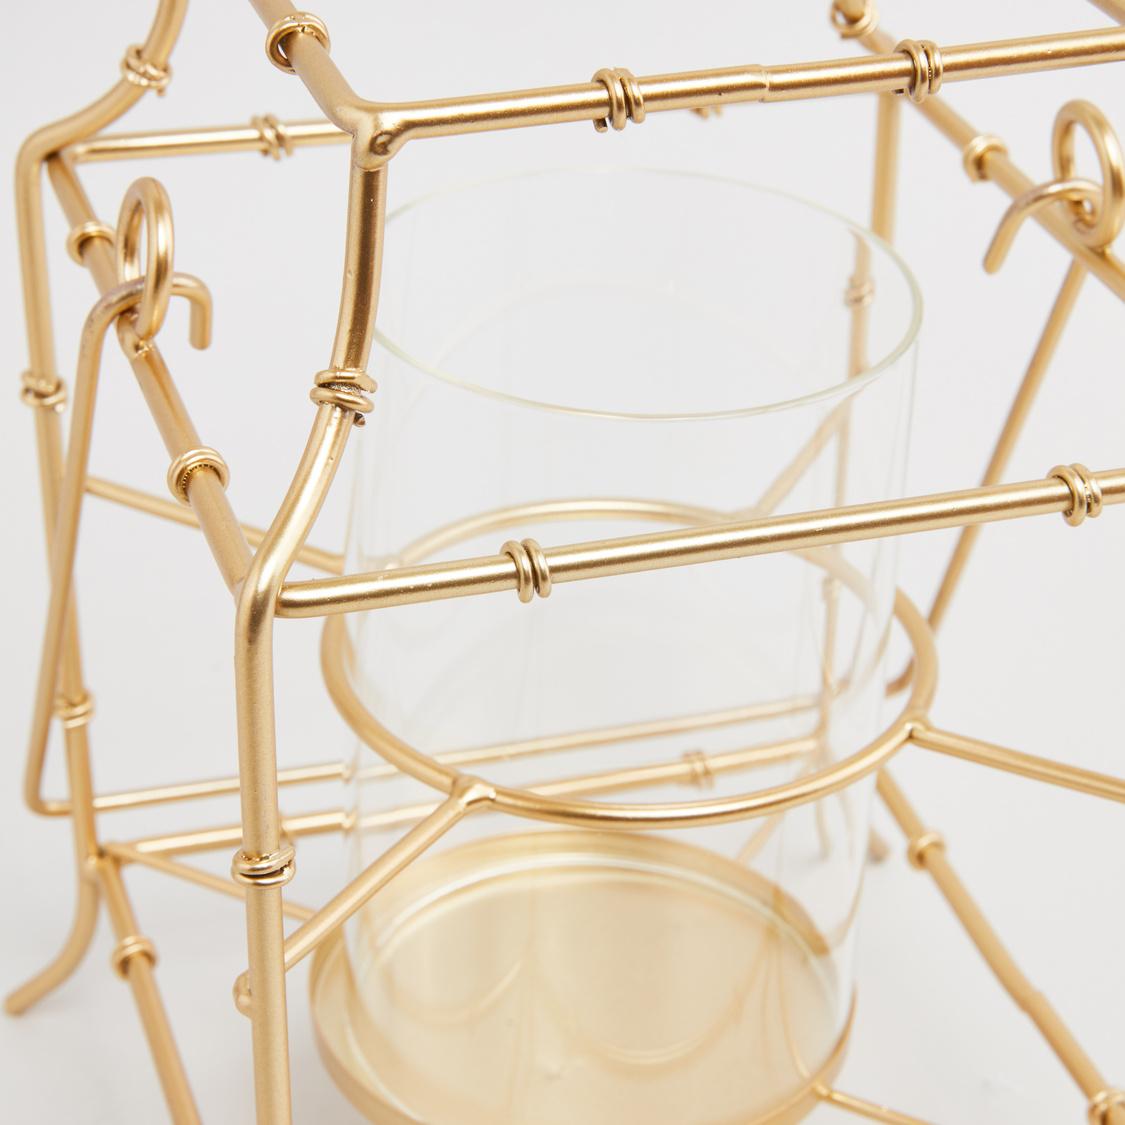 Metal Latticework Candle Lantern - 19 cms